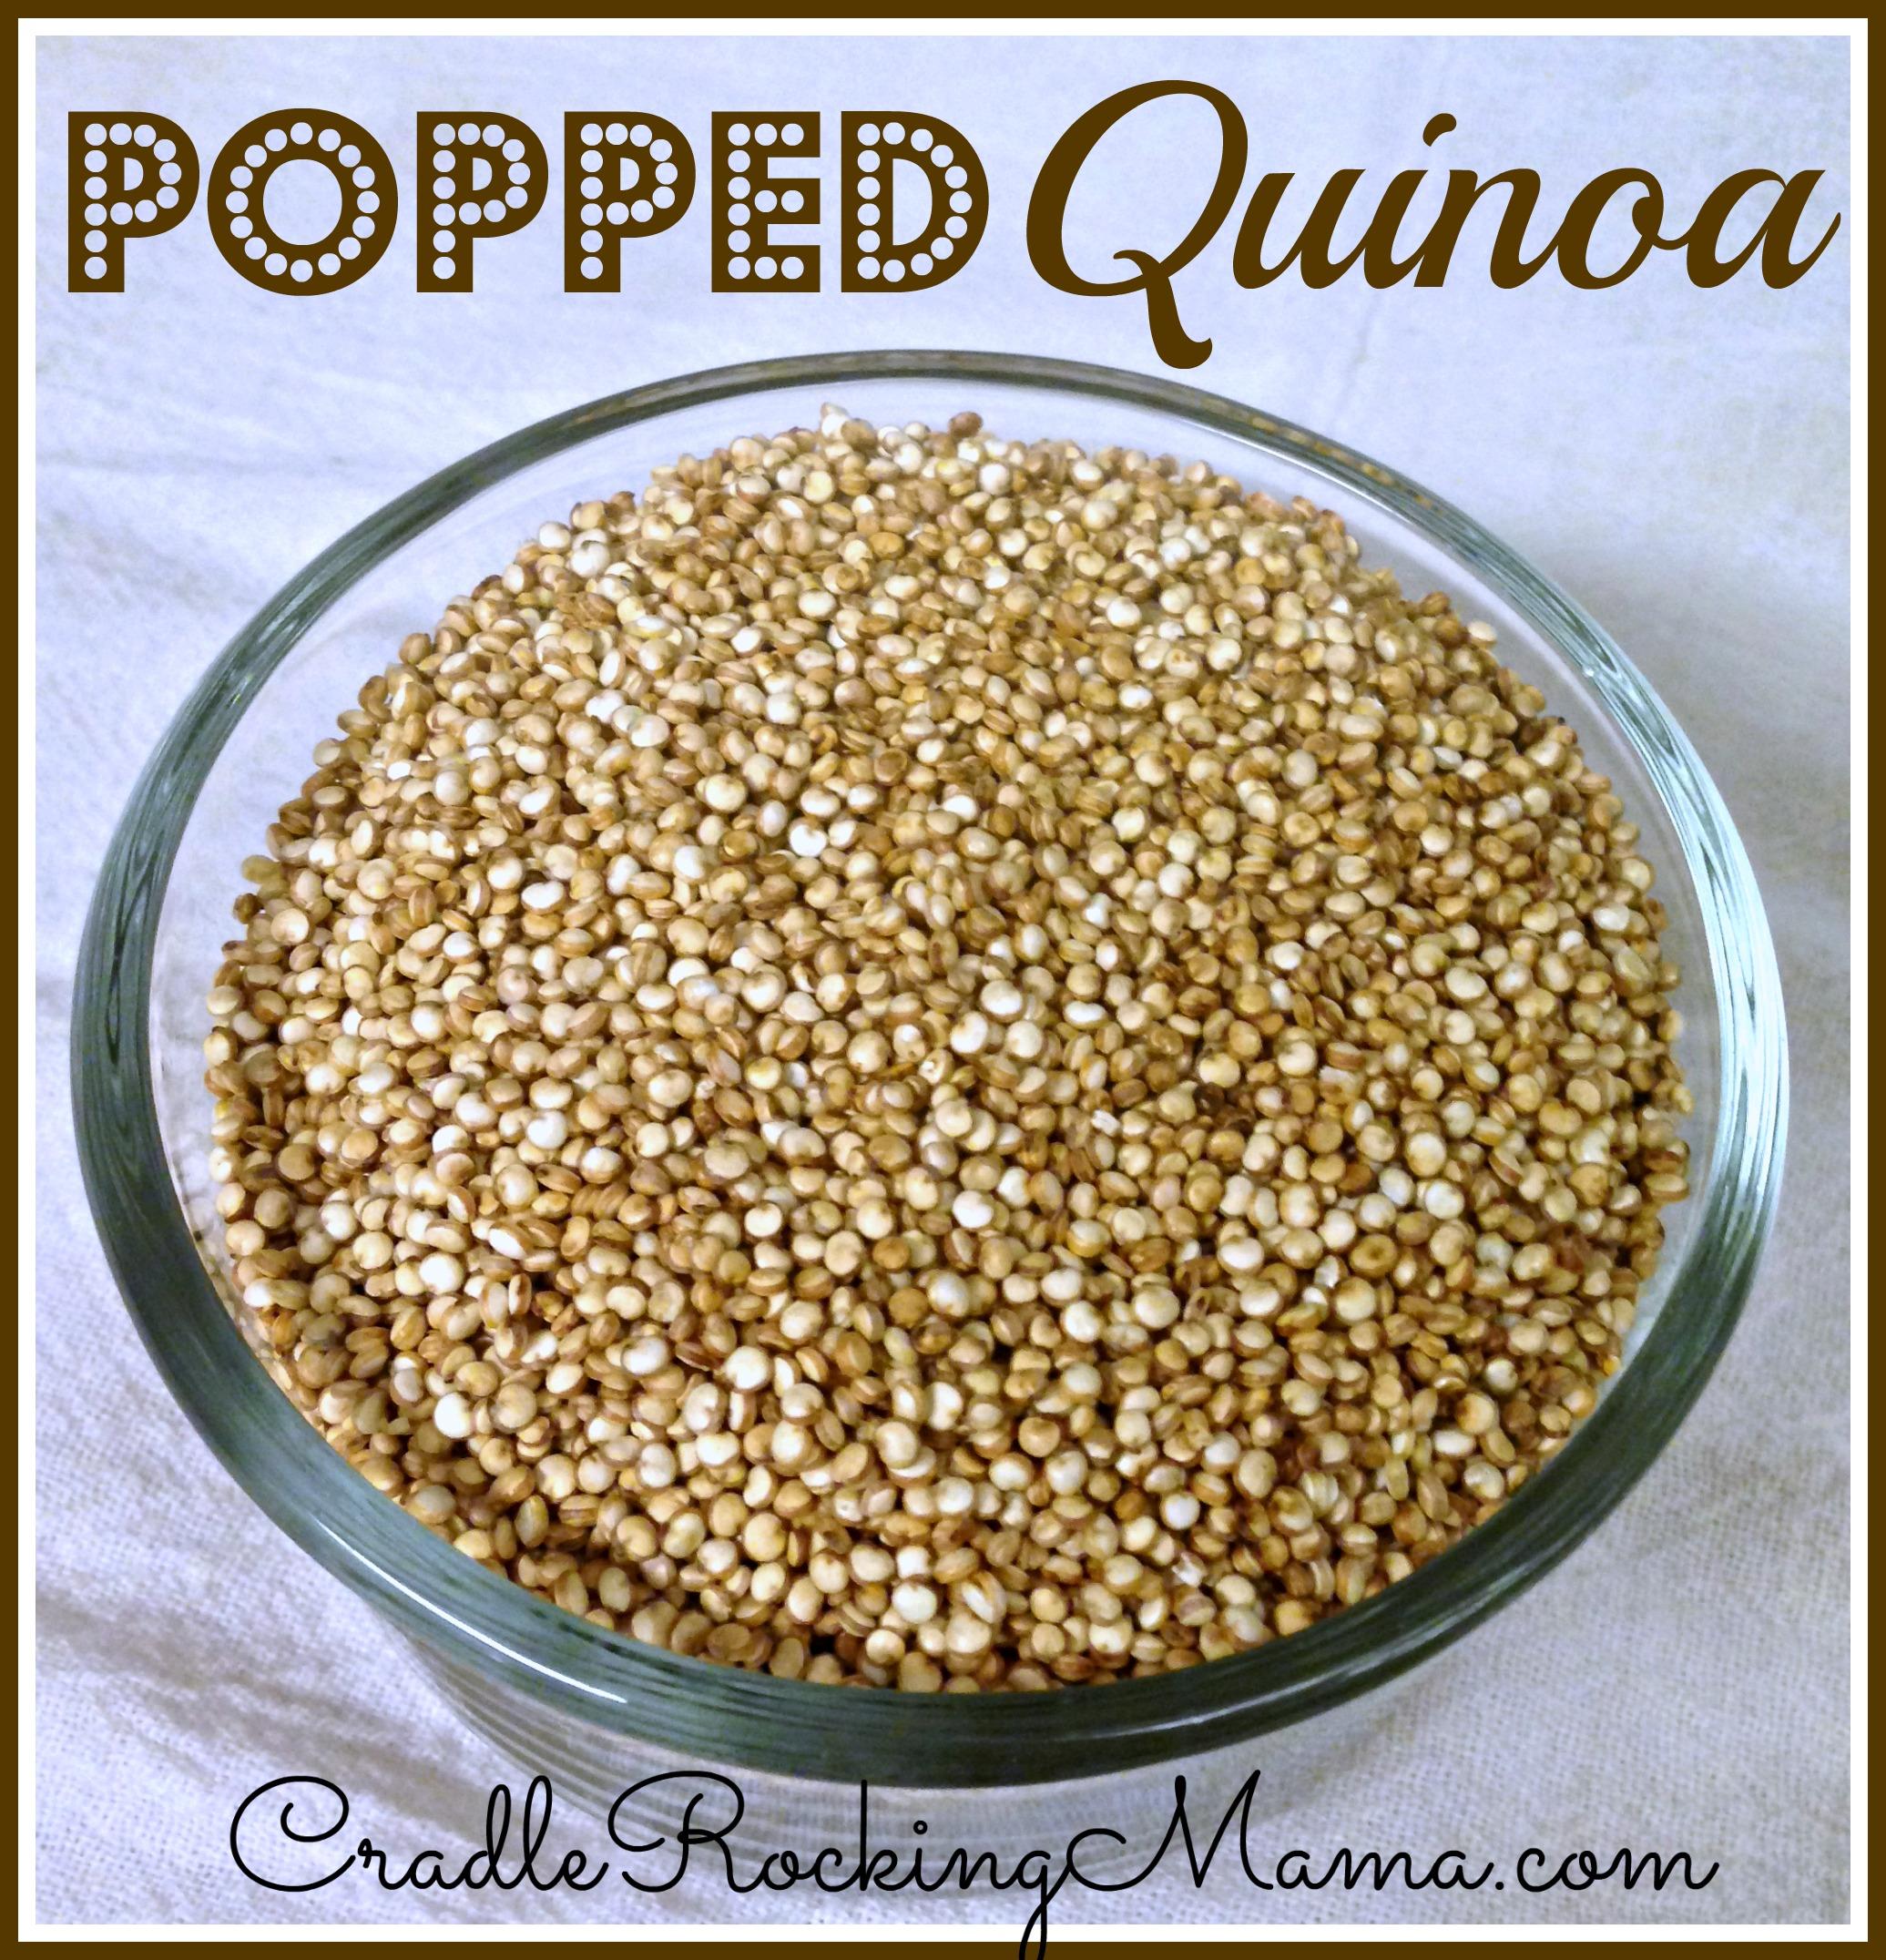 95963 Why Don't We Eat Pop-Quinoa?